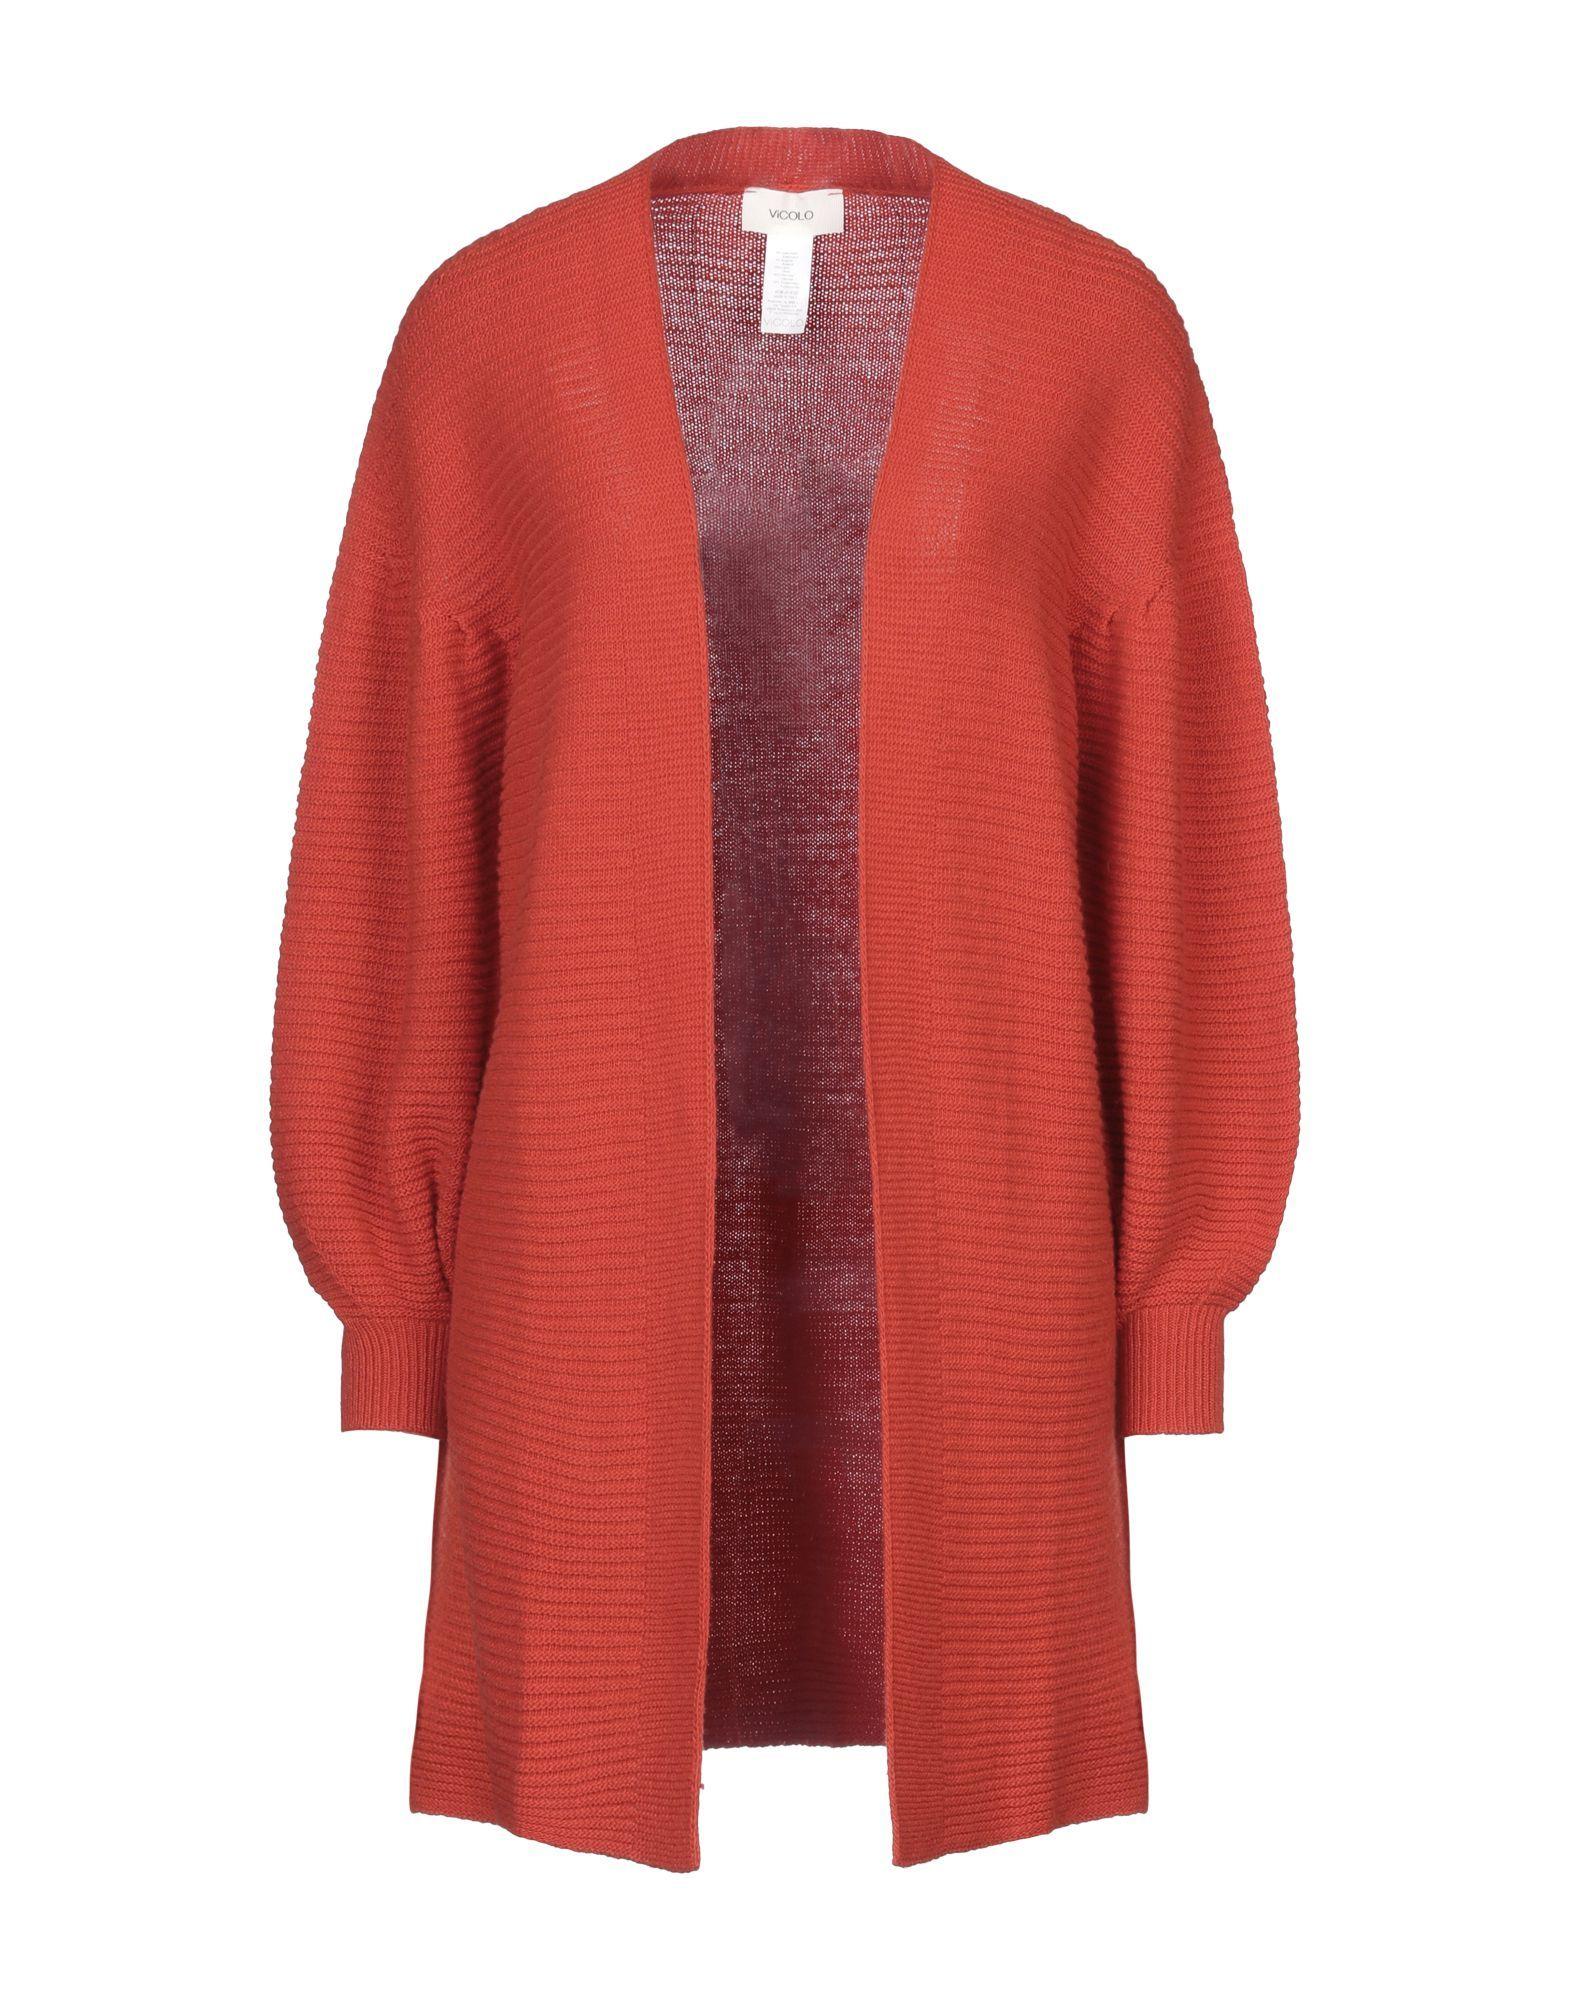 Vicolo Orange Ribbed Knit Cardigan